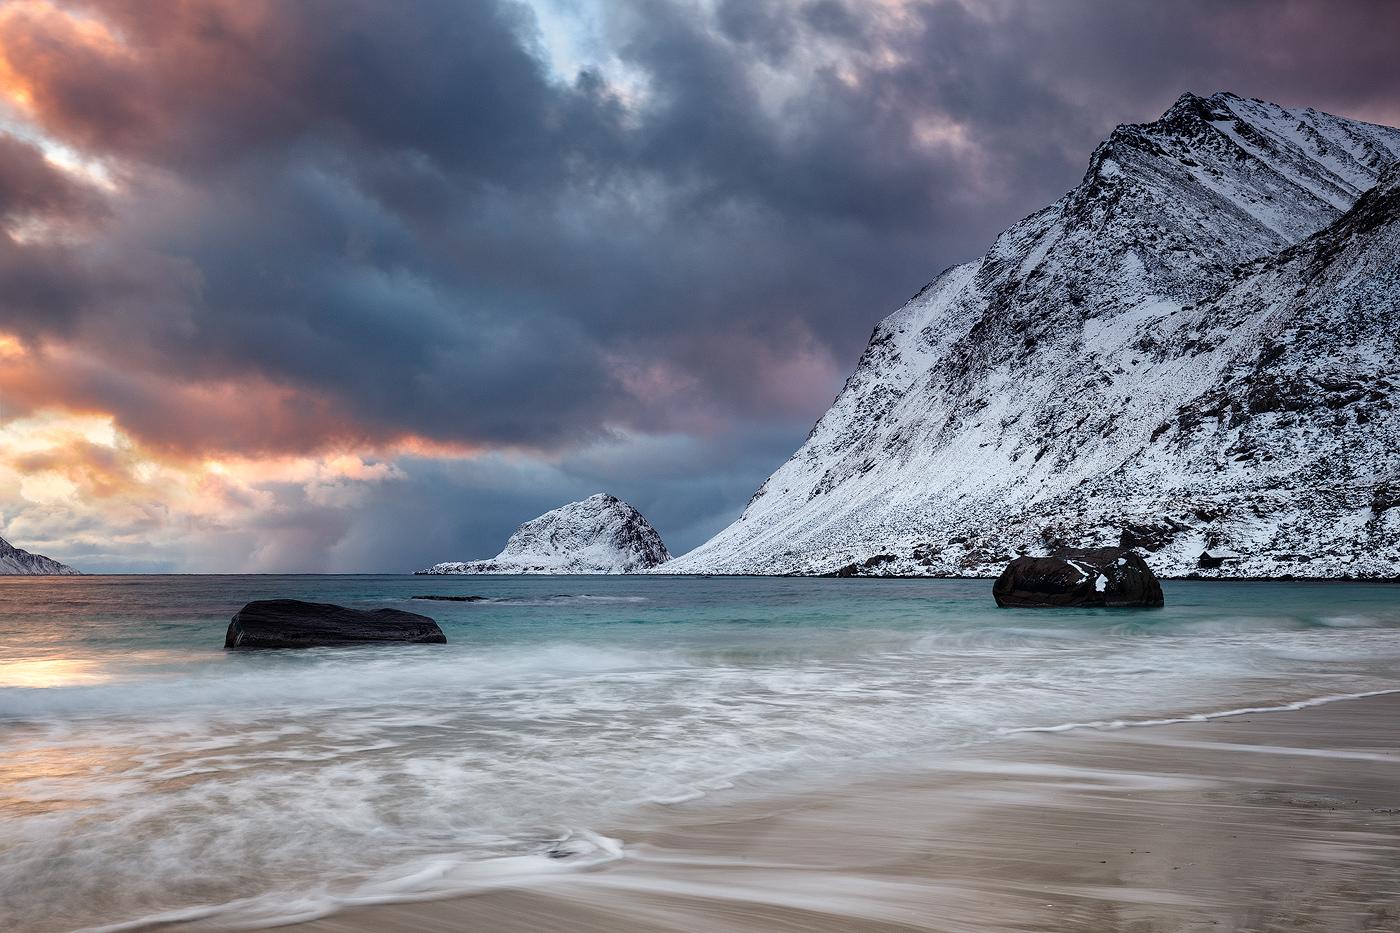 lofoten norvege - nicolas rottiers photographe caen normandie